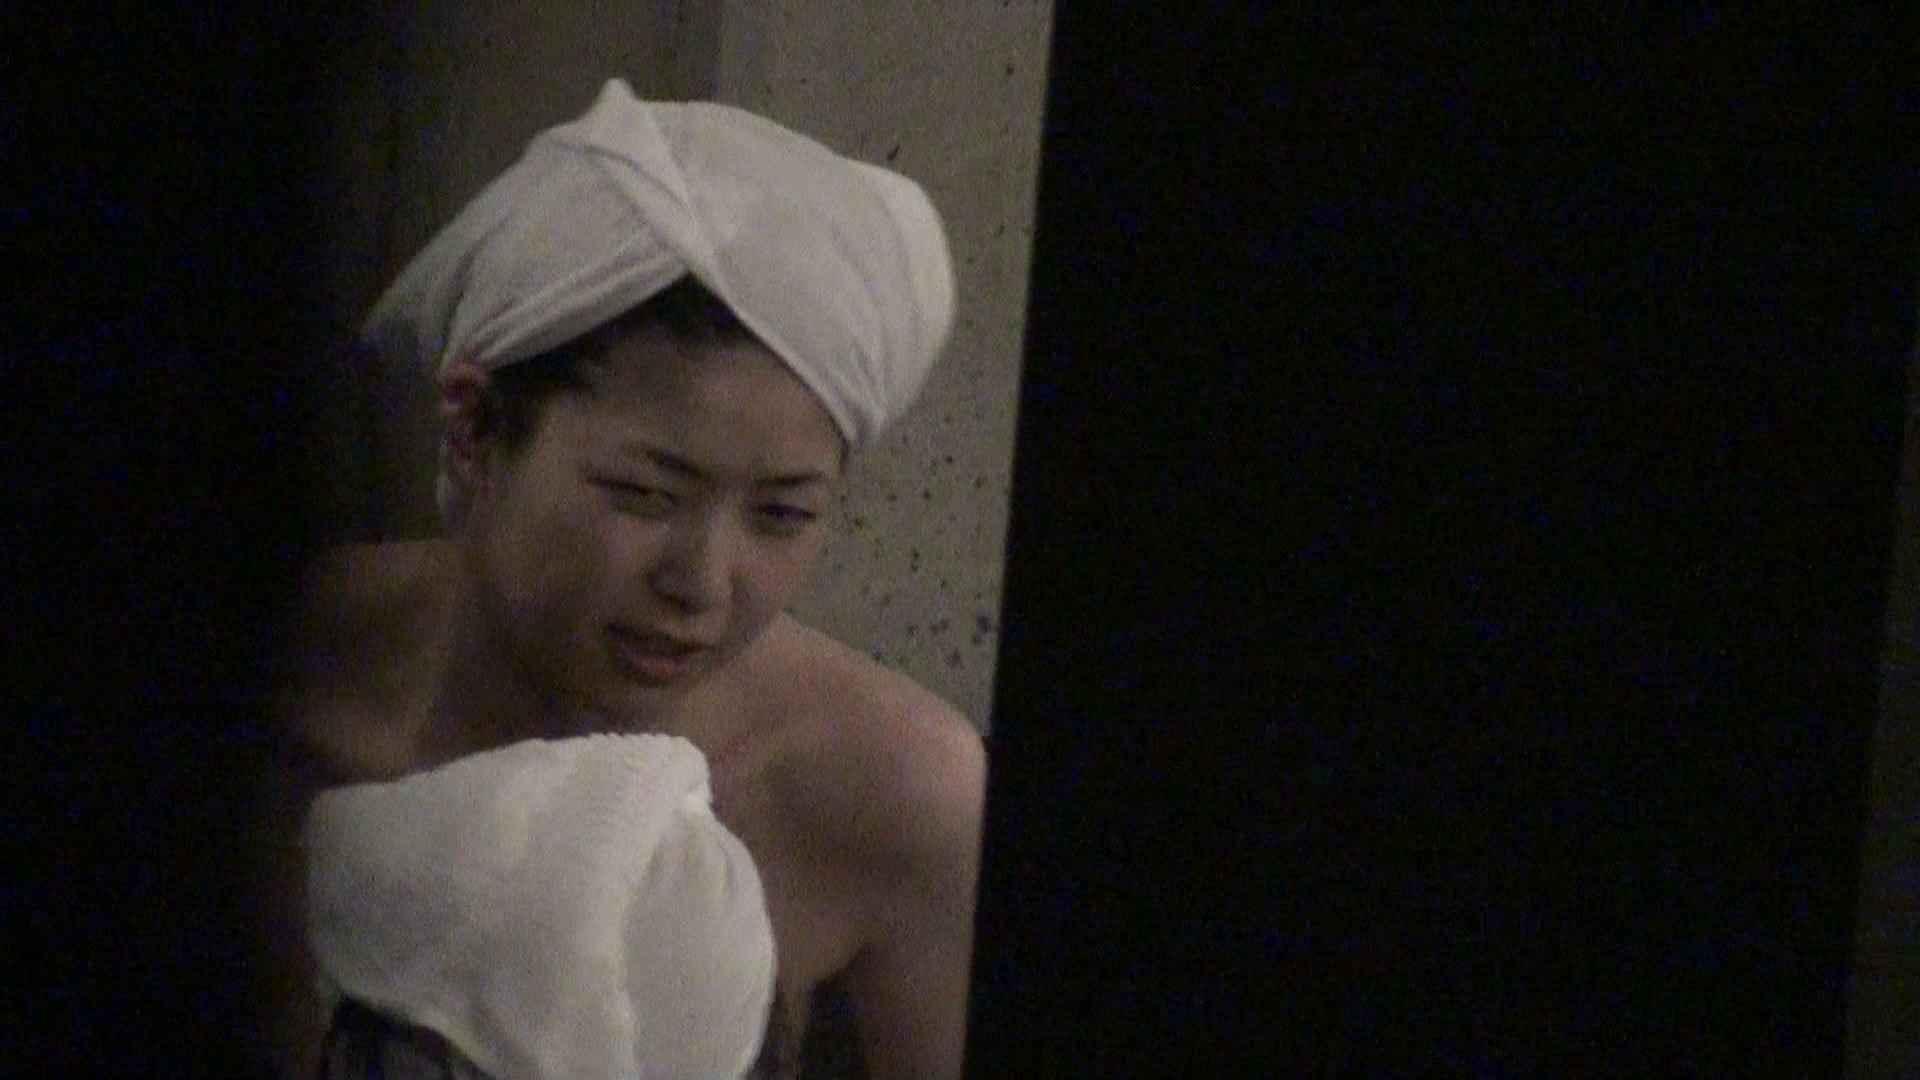 Aquaな露天風呂Vol.401 0   0  60連発 46